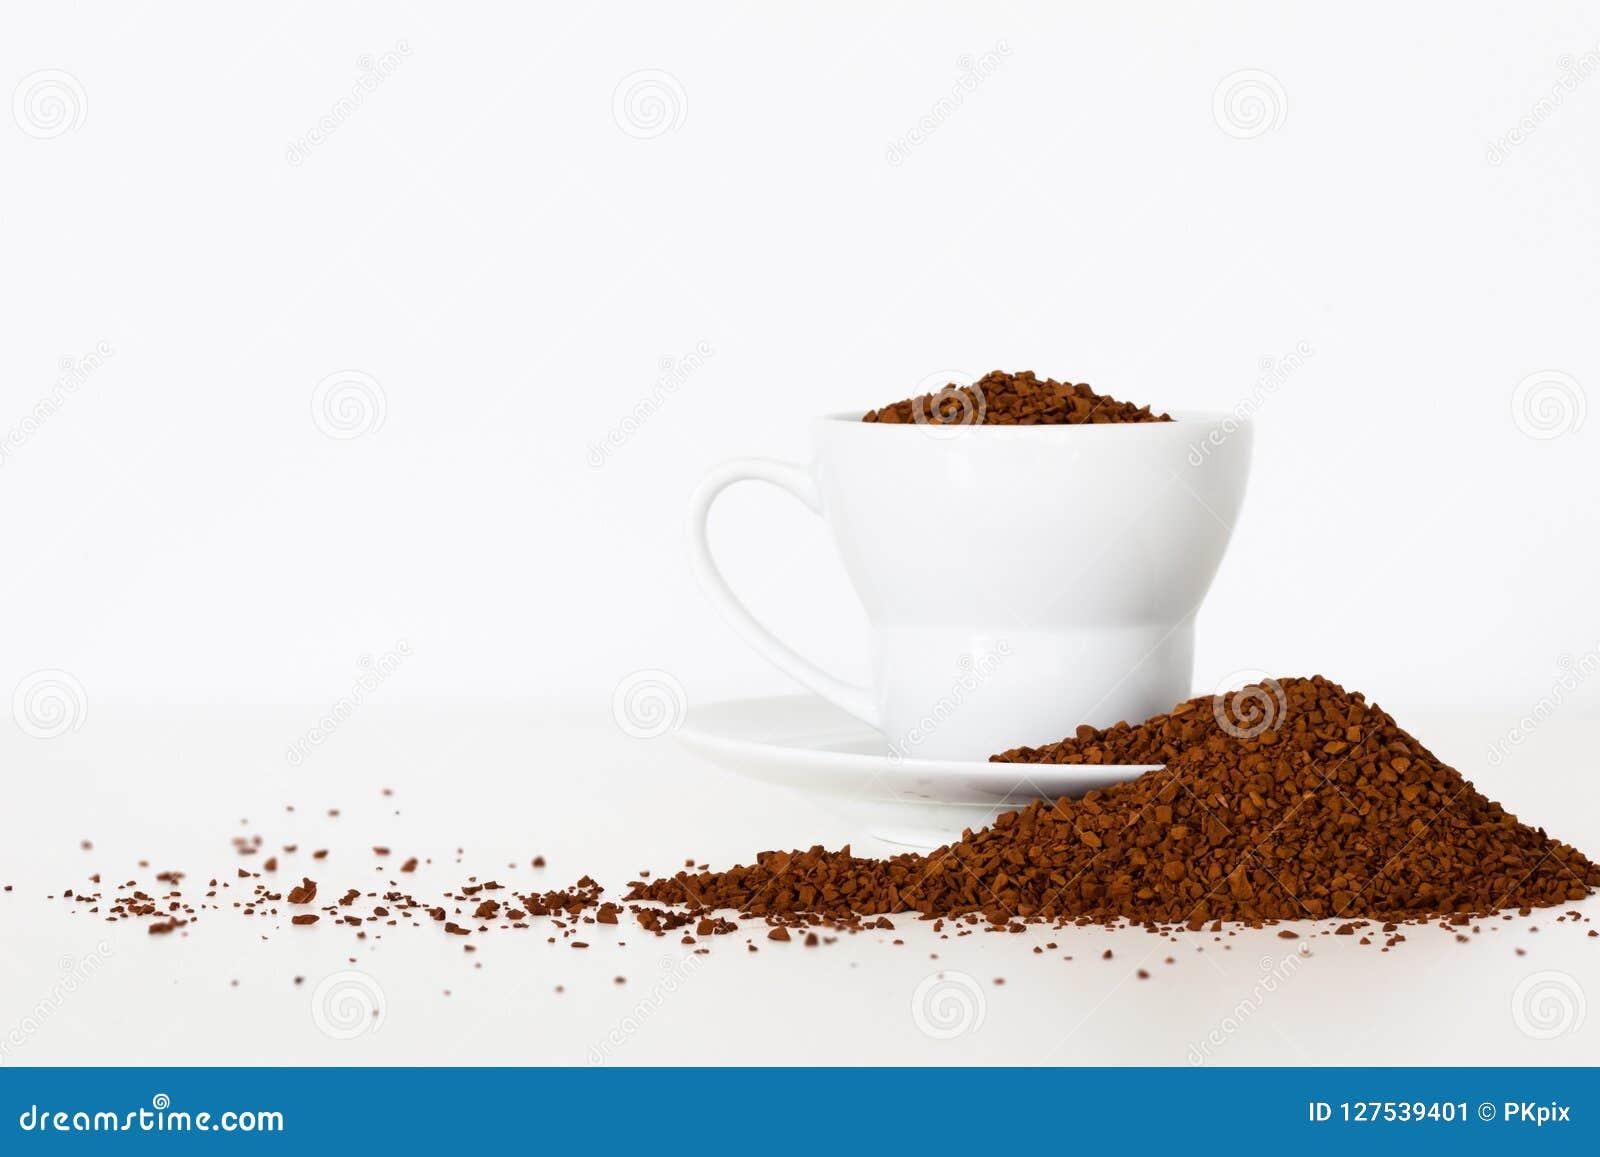 Prachtig getoonde koffieboonstapel rond kop op witte achtergrond